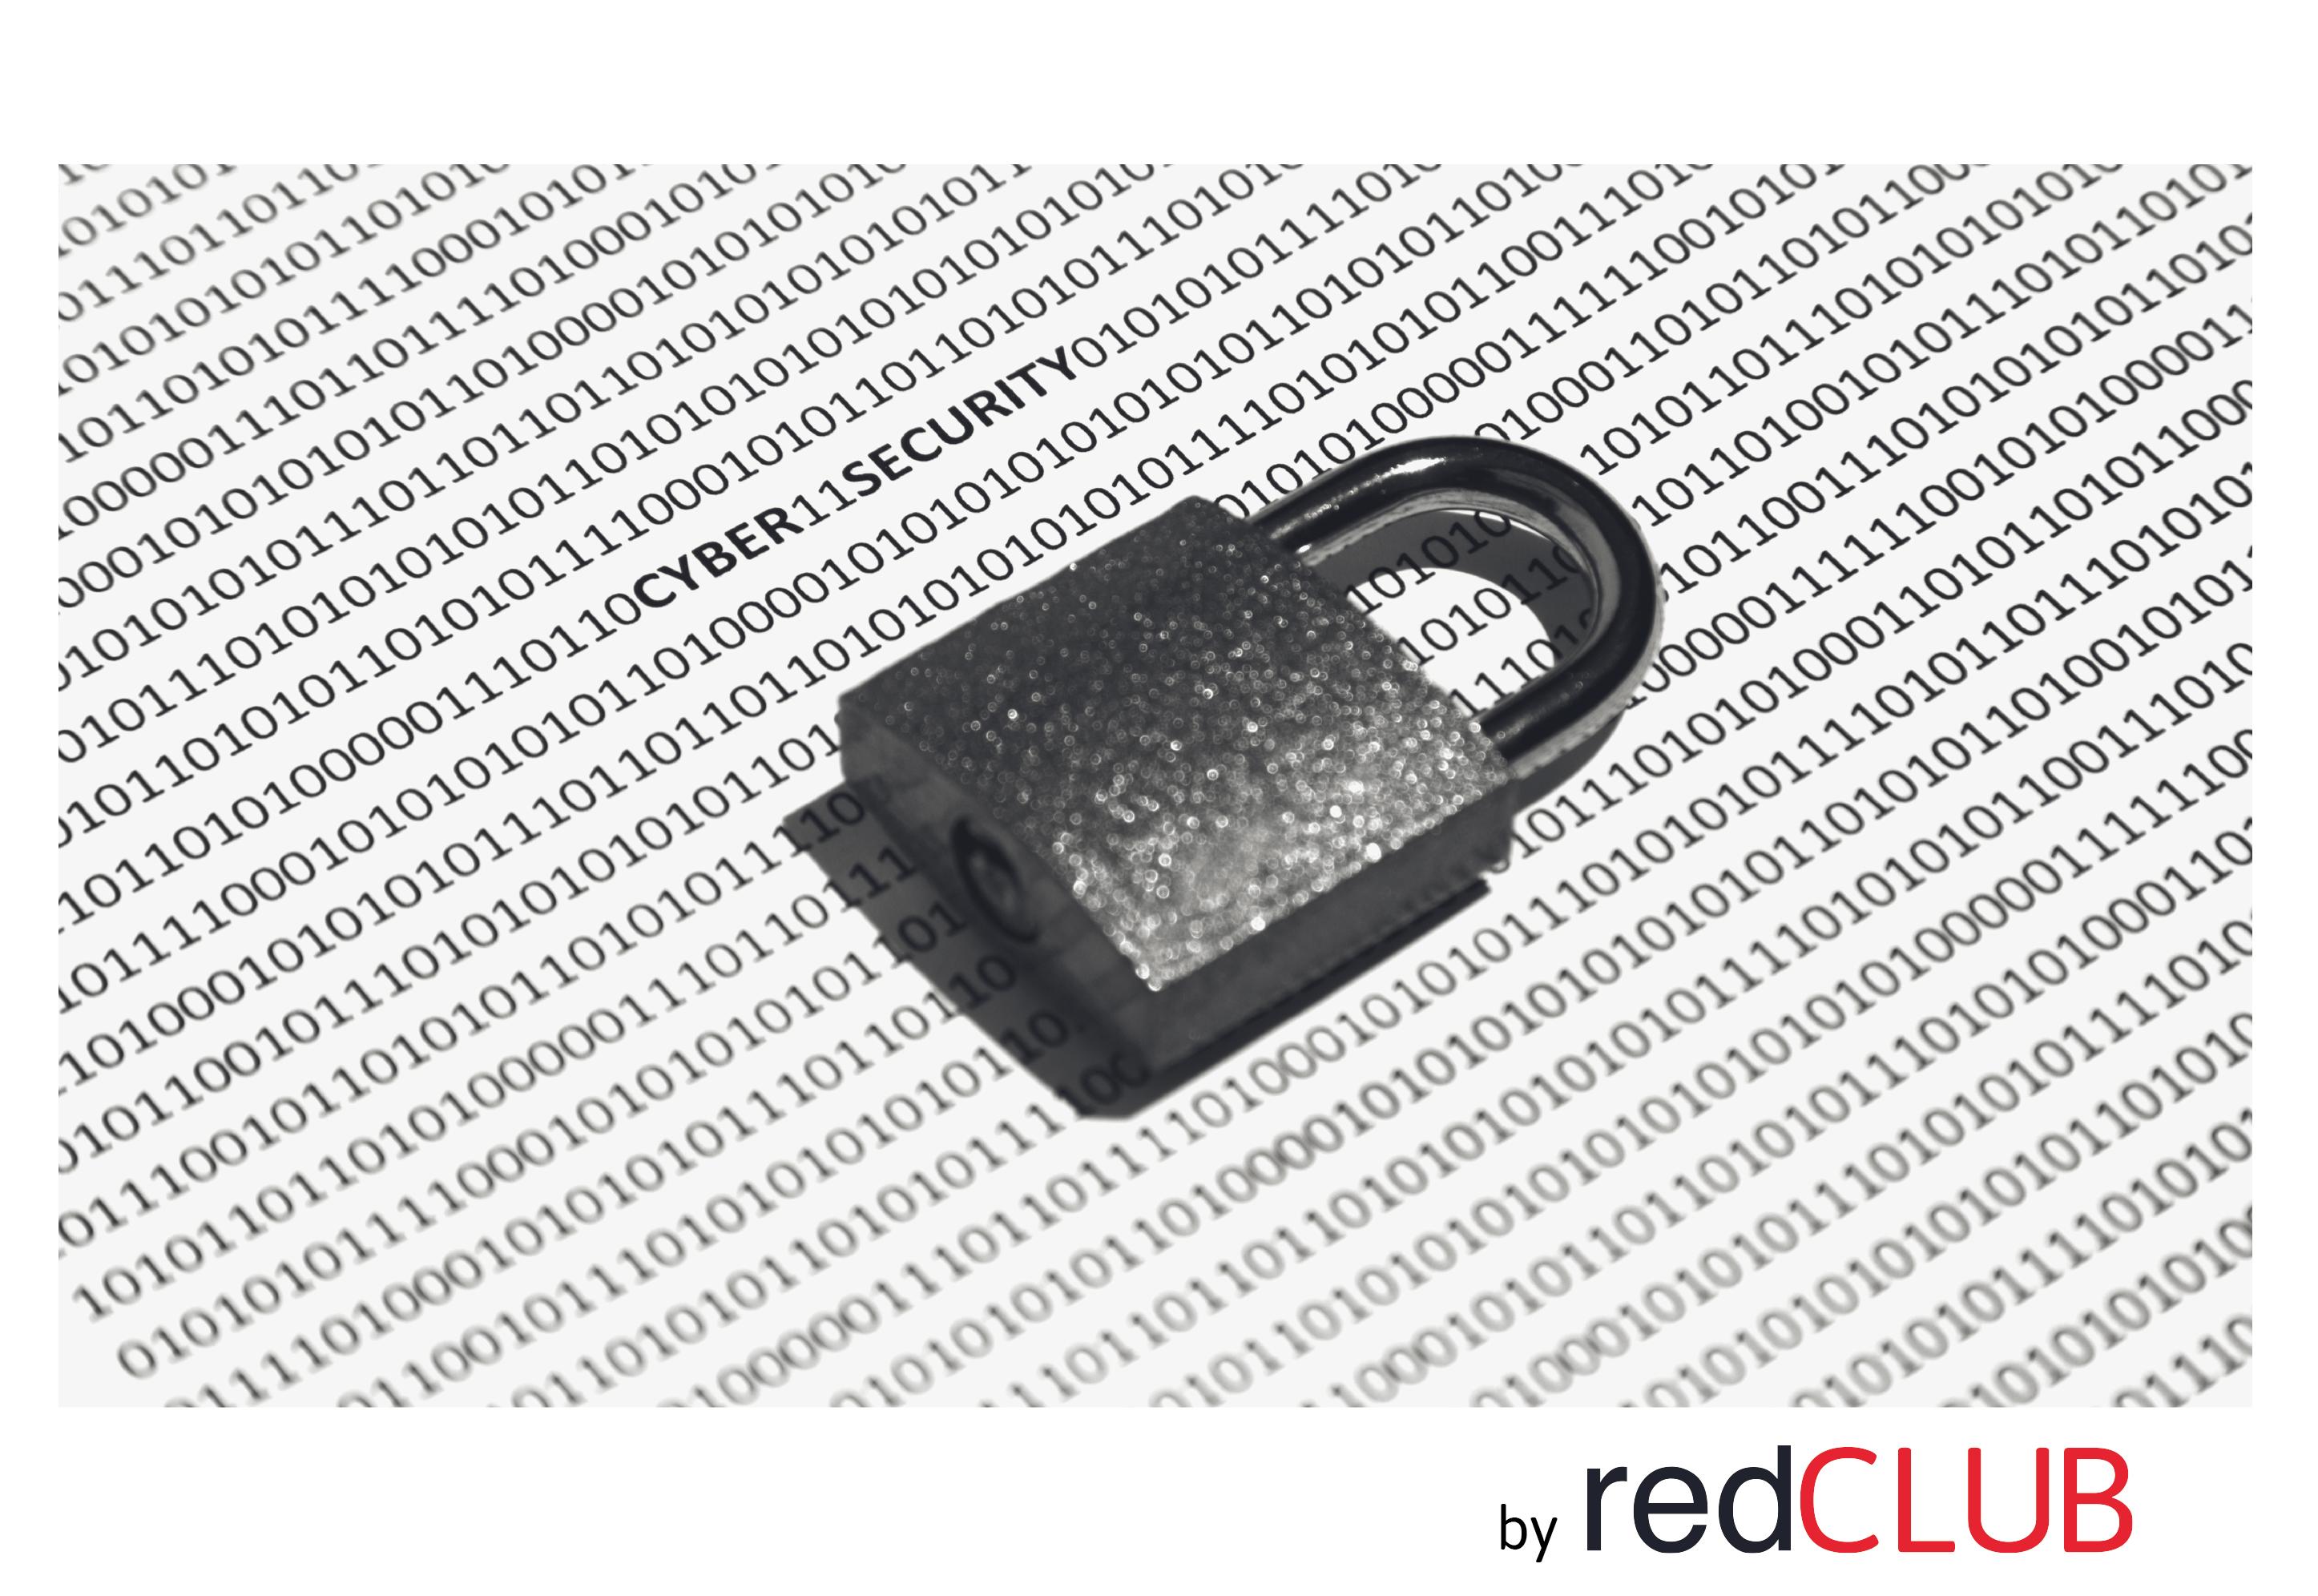 redCLUB: IT-Security